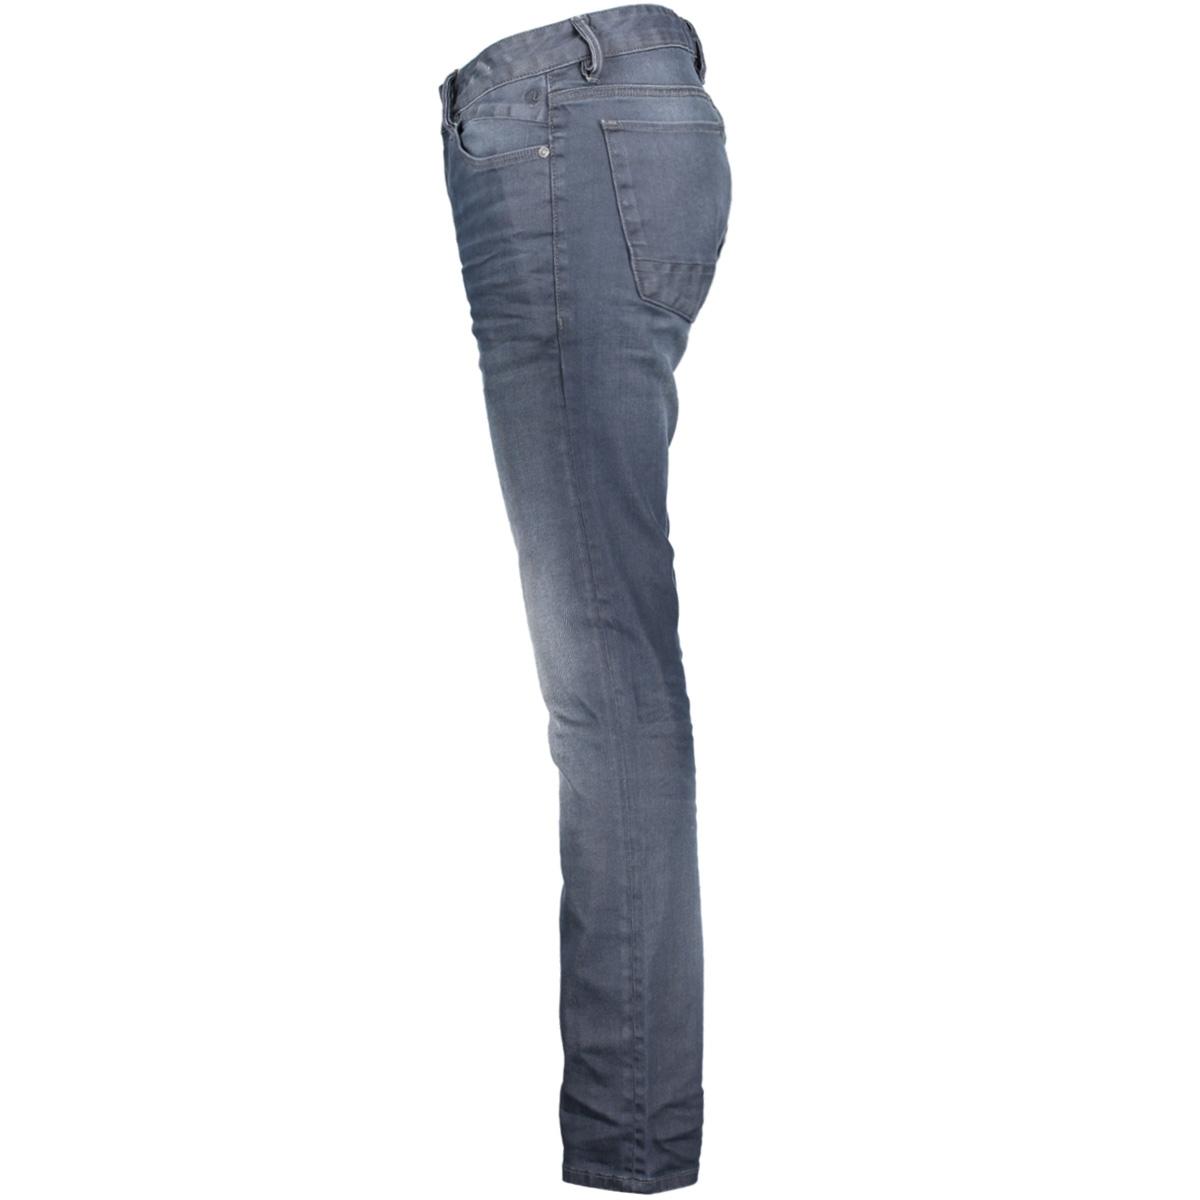 ctr390-bbu cast iron jeans bbu